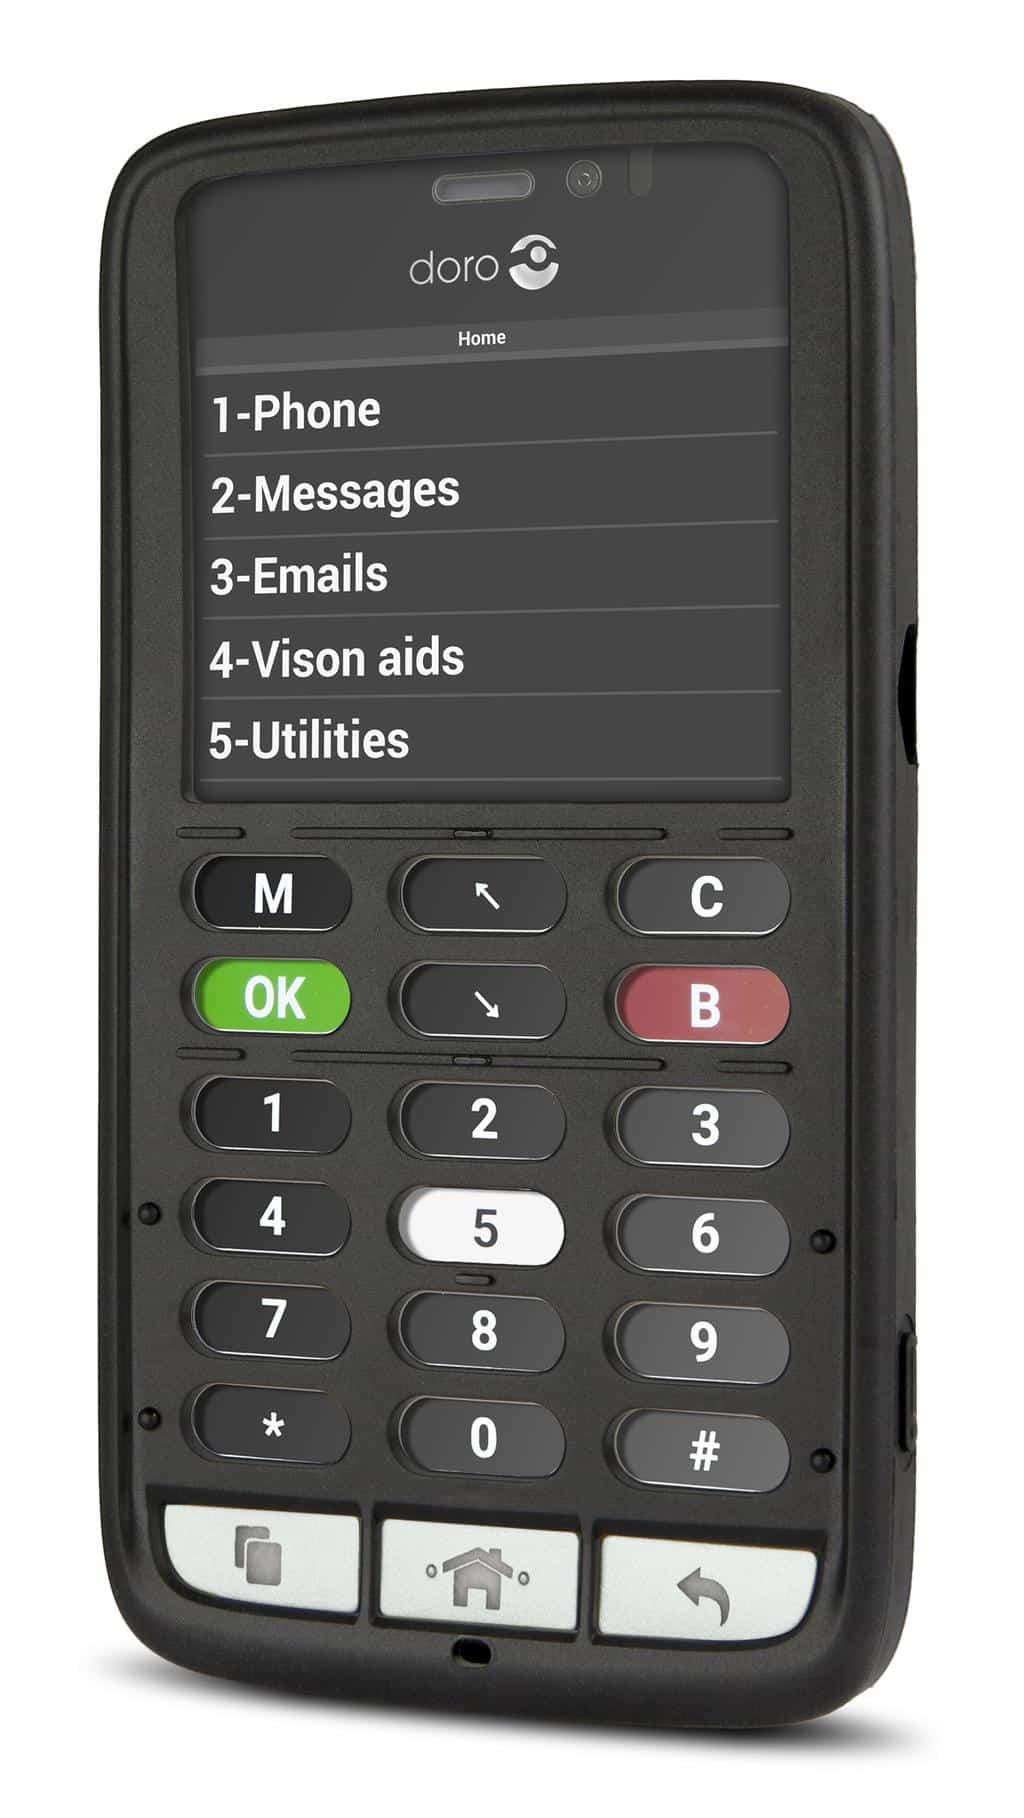 téléphone malentendant - urgence Doro 8030C - Blog SFAM